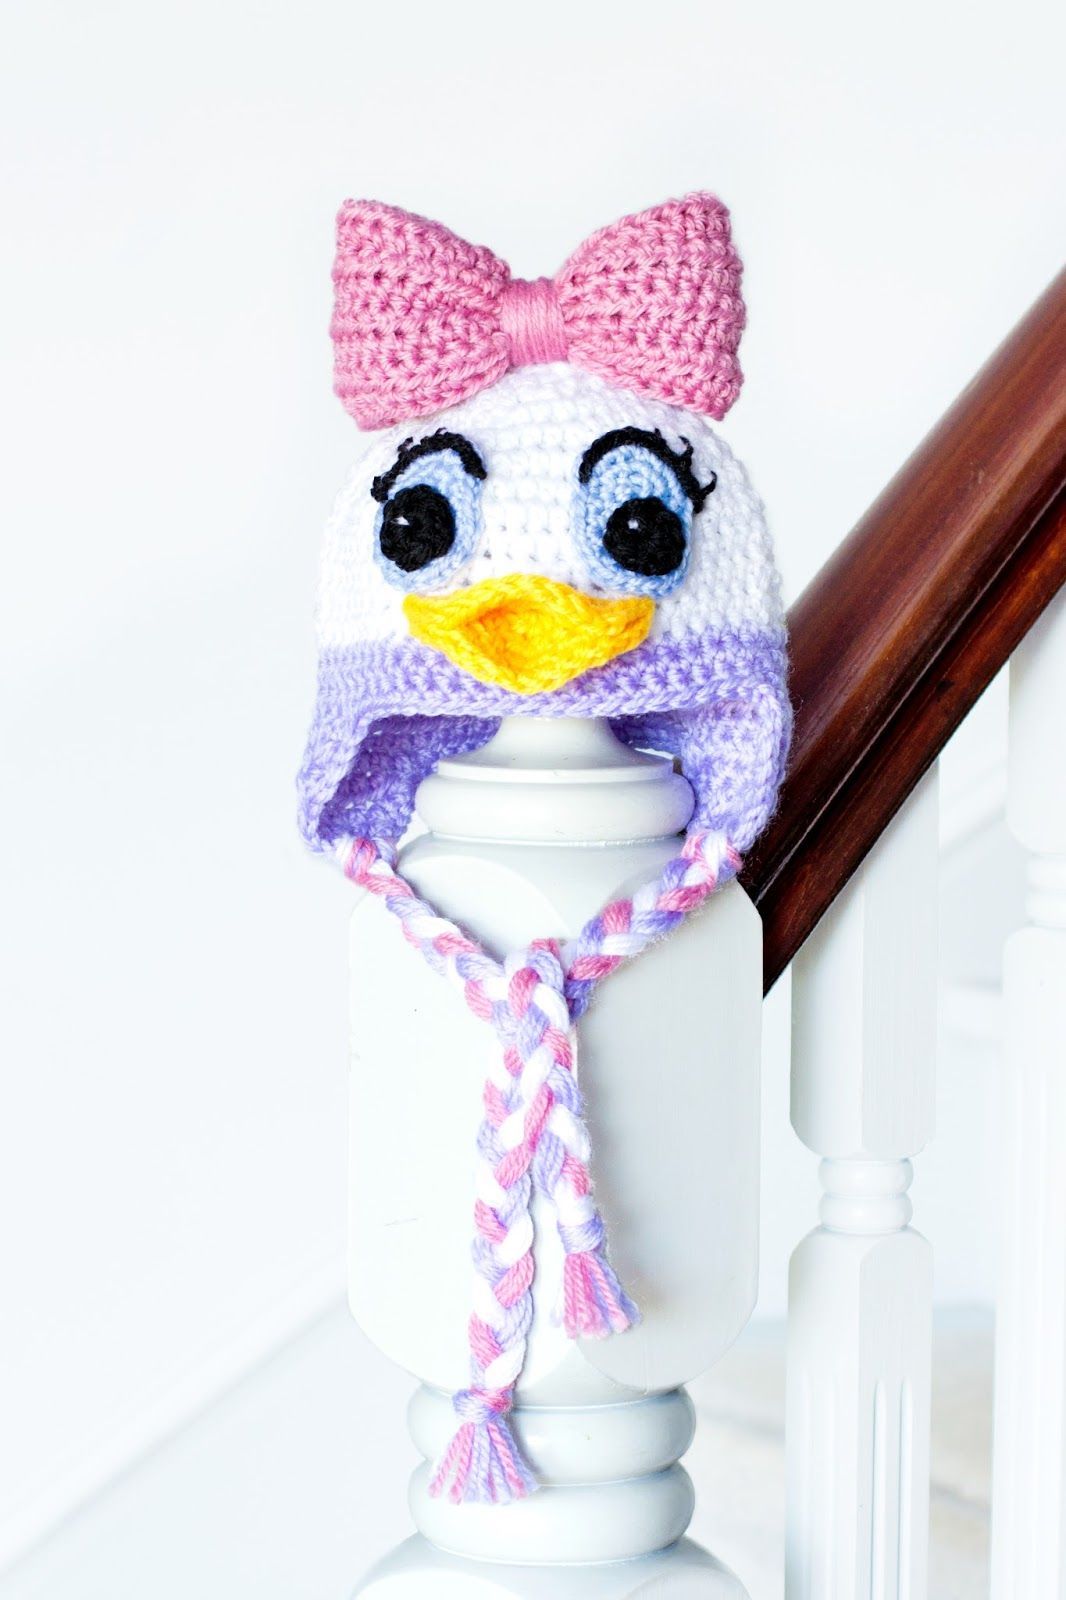 Daisy Duck Inspired Baby Hat Crochet Pattern | Las modelos, Miel y ...